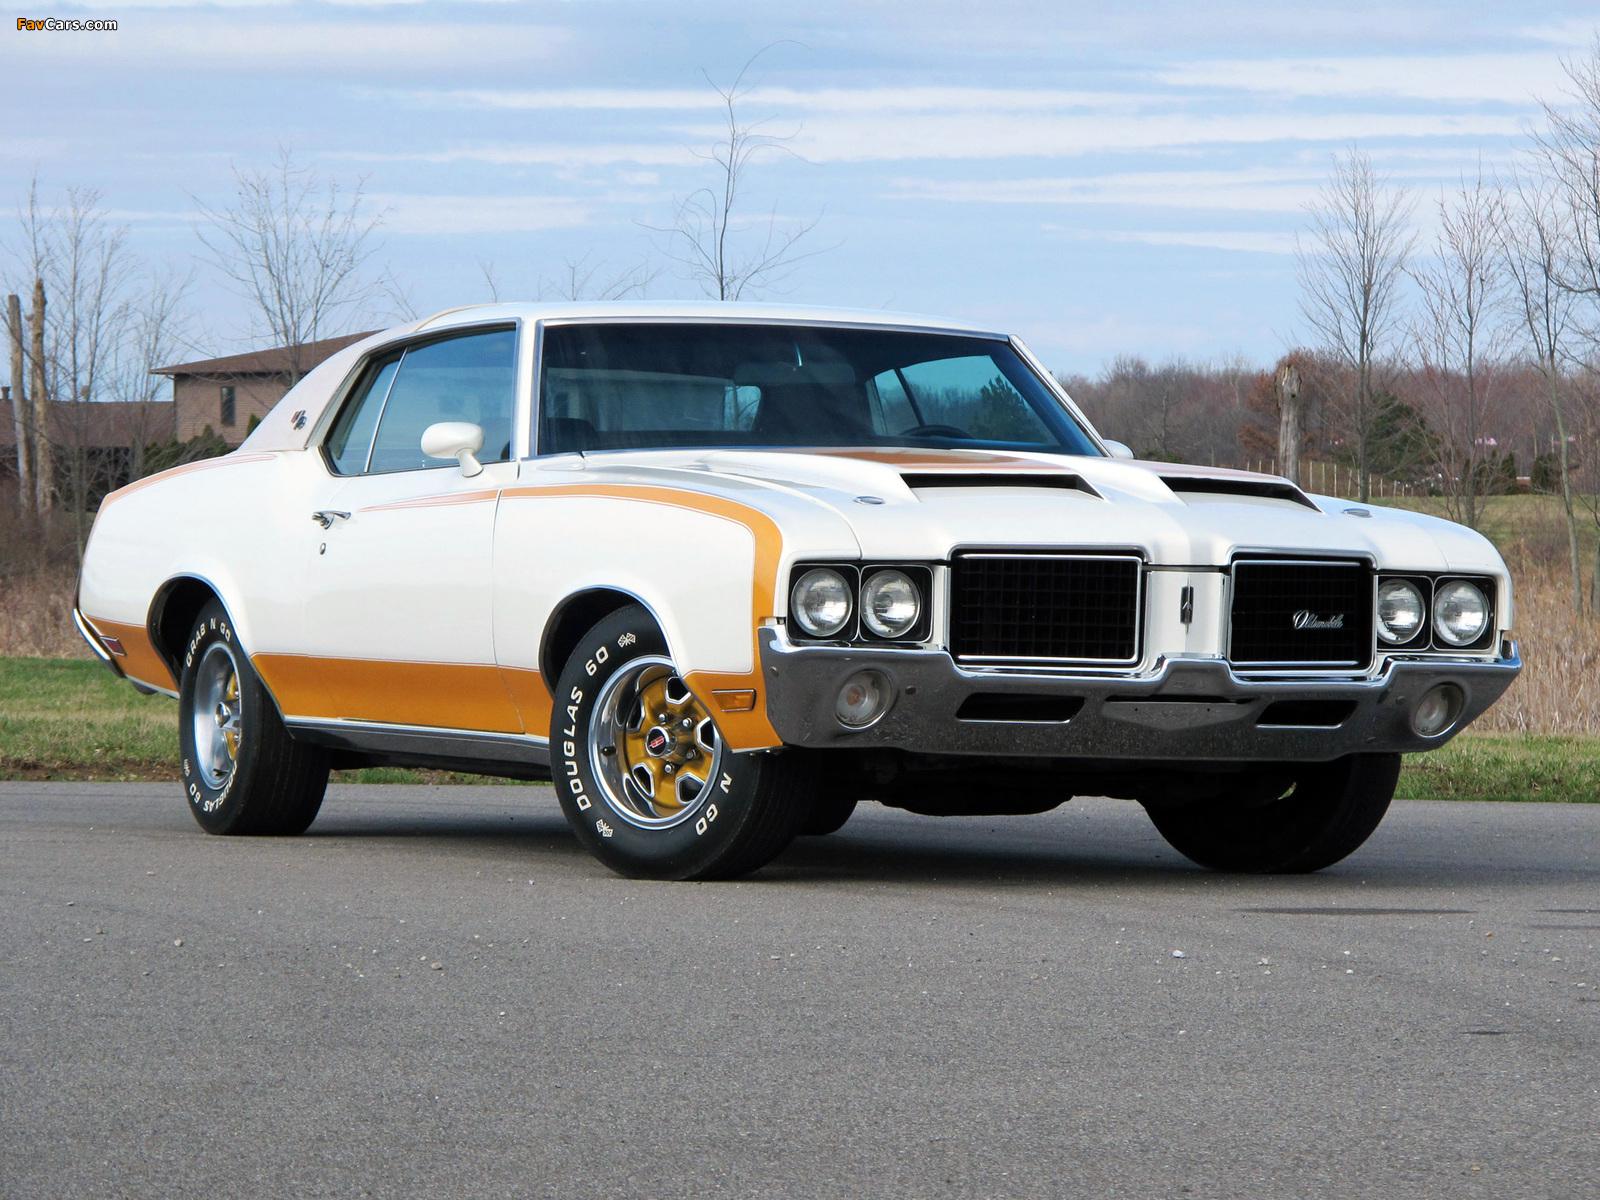 Hurst/Olds Cutlass Supreme Hardtop Coupe Indy 500 Pace Car 1972 photos (1600 x 1200)